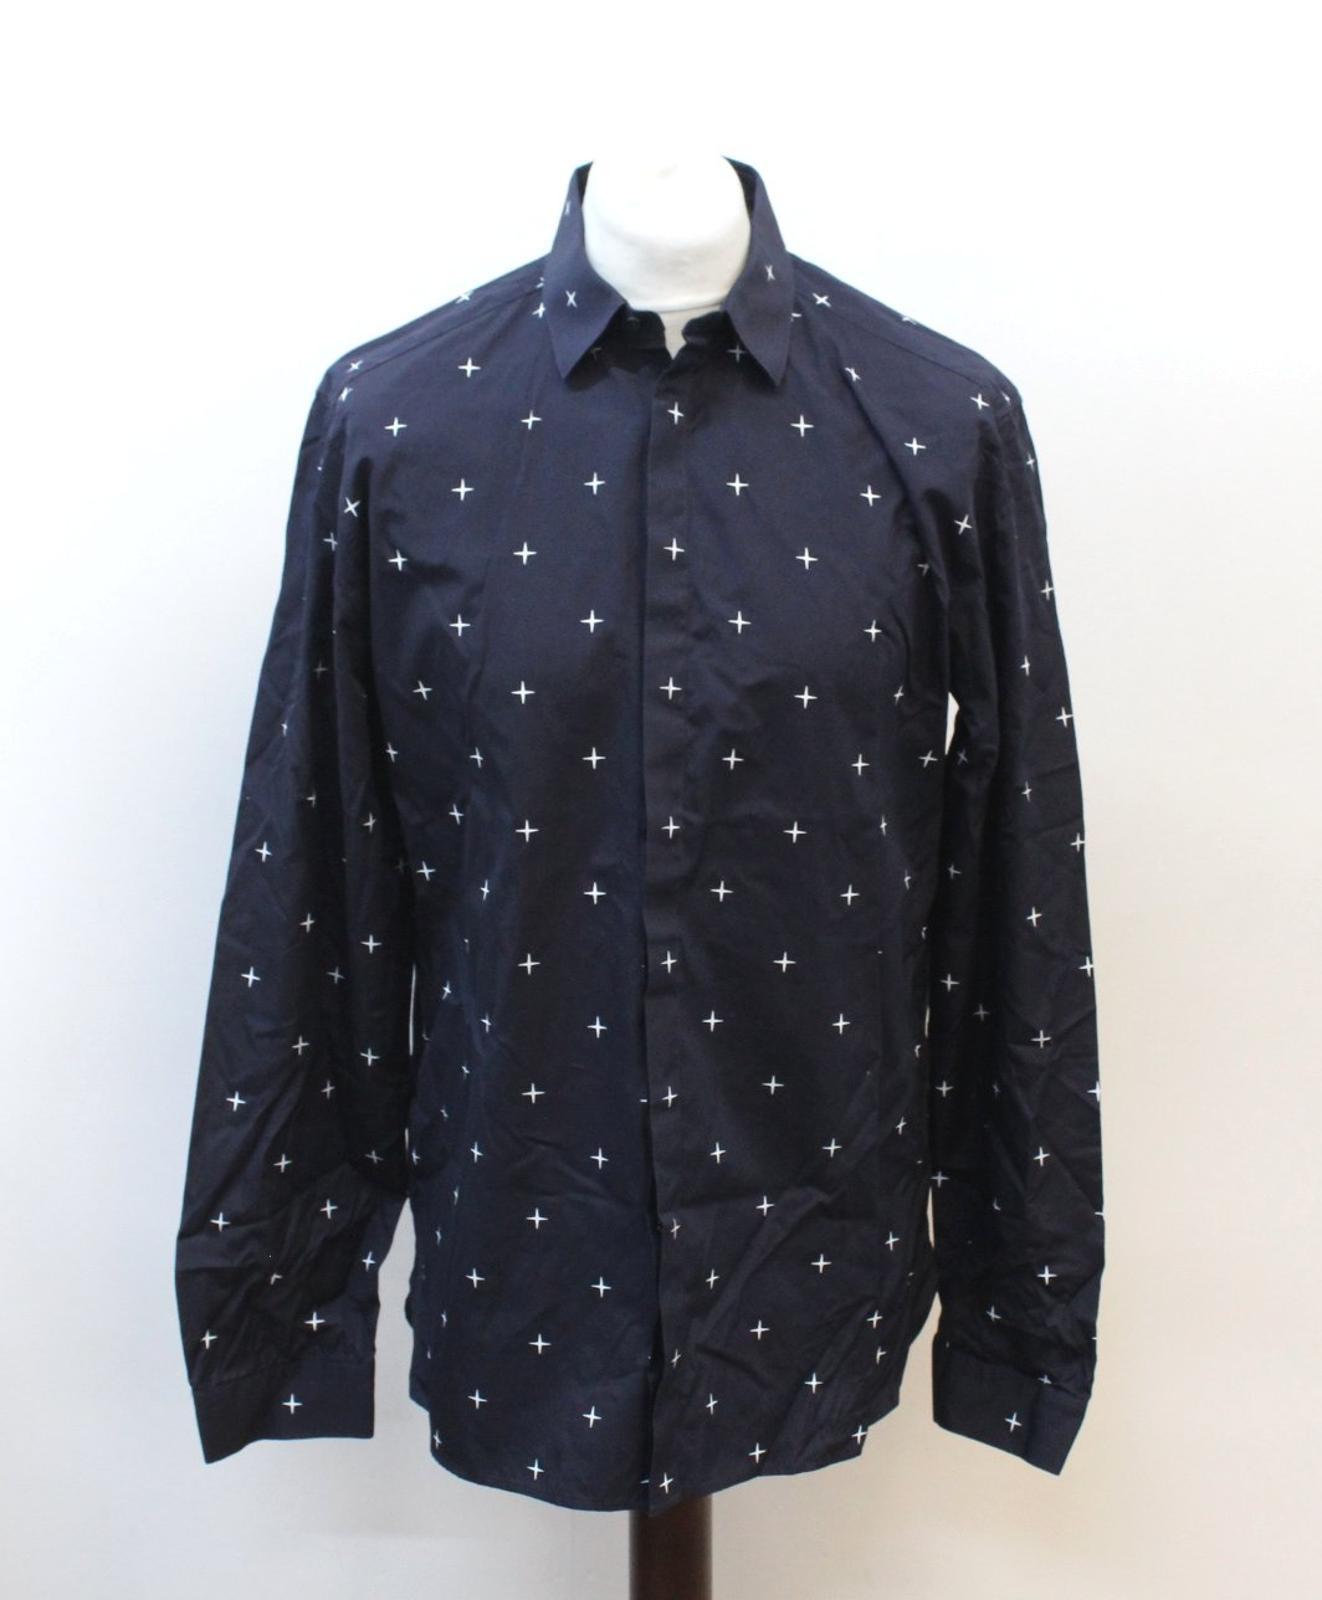 Neil-Barrett-Hombre-Azul-Marino-Blanco-Cuello-De-Camisa-formal-calce-Cruz-16-5-034-42cm miniatura 10